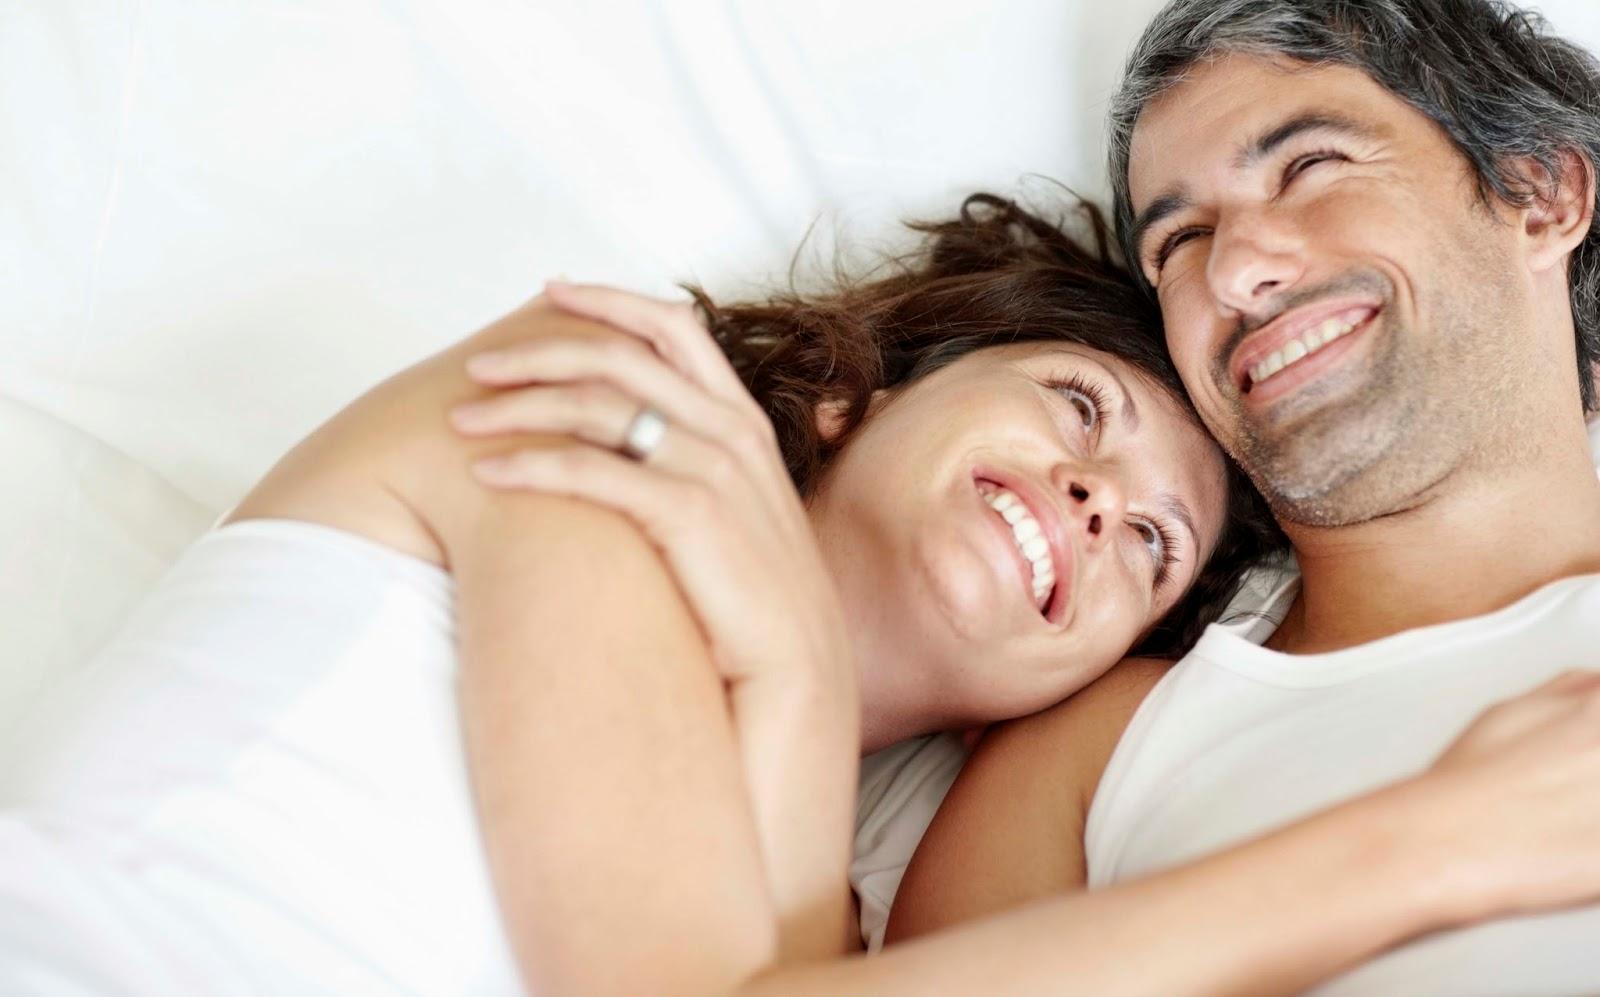 супруги в кровати видео